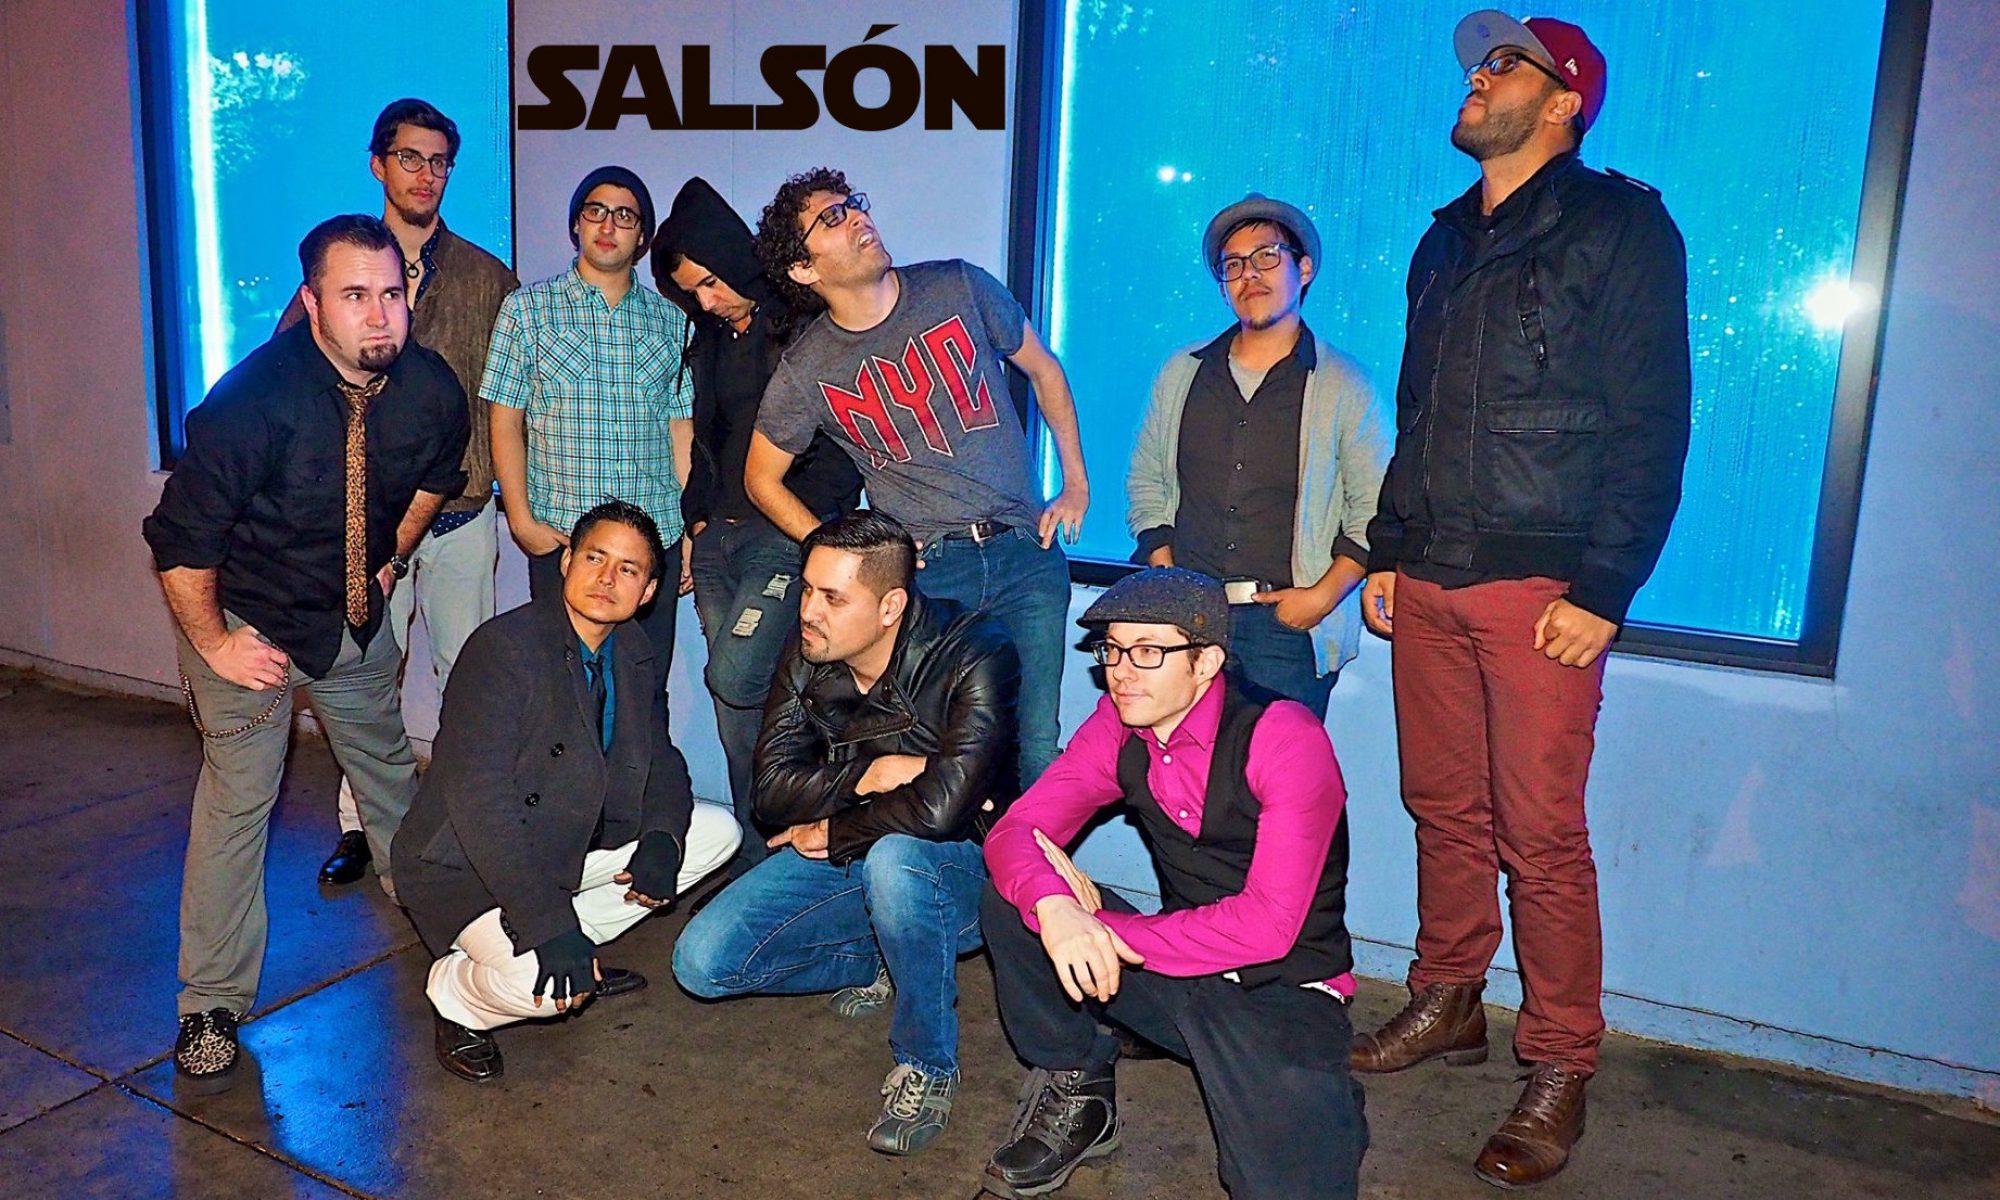 Salson - Salsa Music!